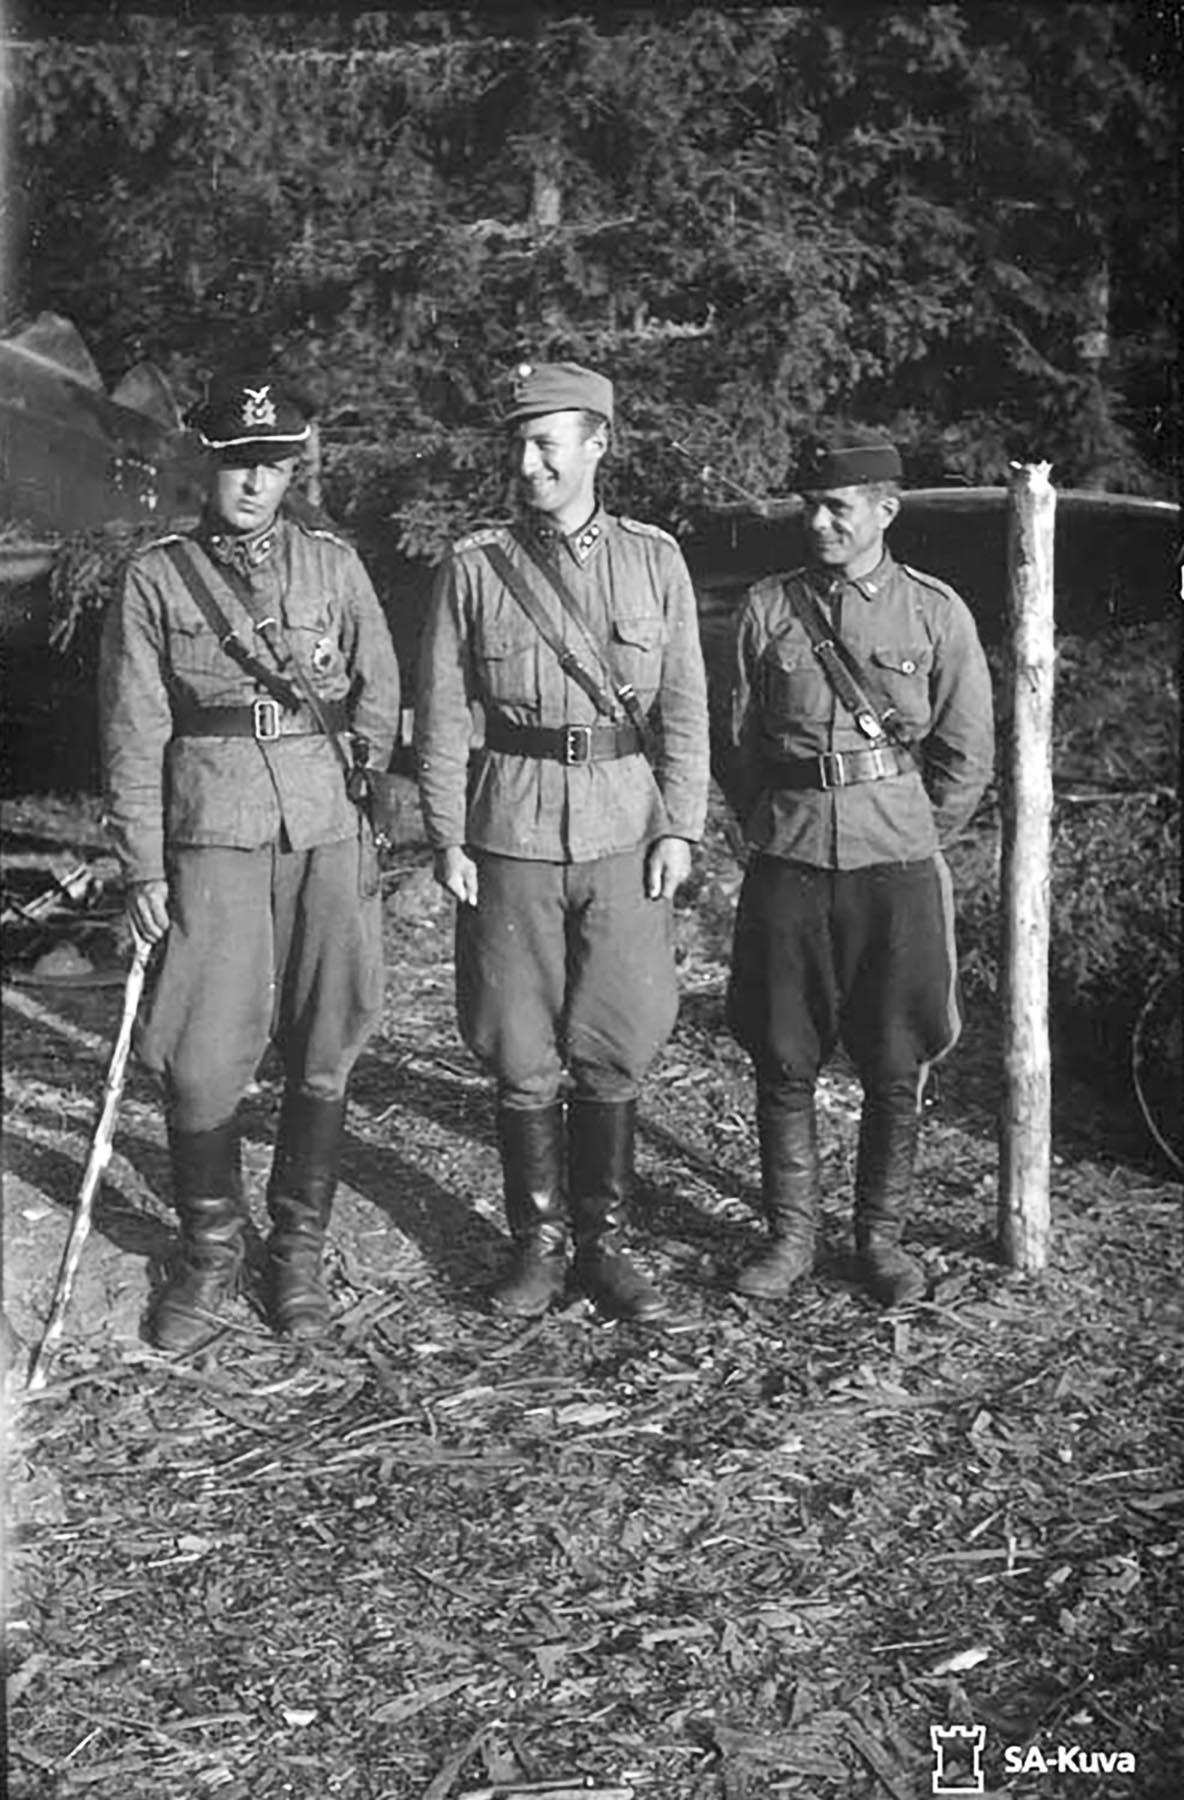 Aircrew FAF from L R Olli Puhakka, Eero Enroth and Lautamaki at Lunkula 13th Aug 1941 01